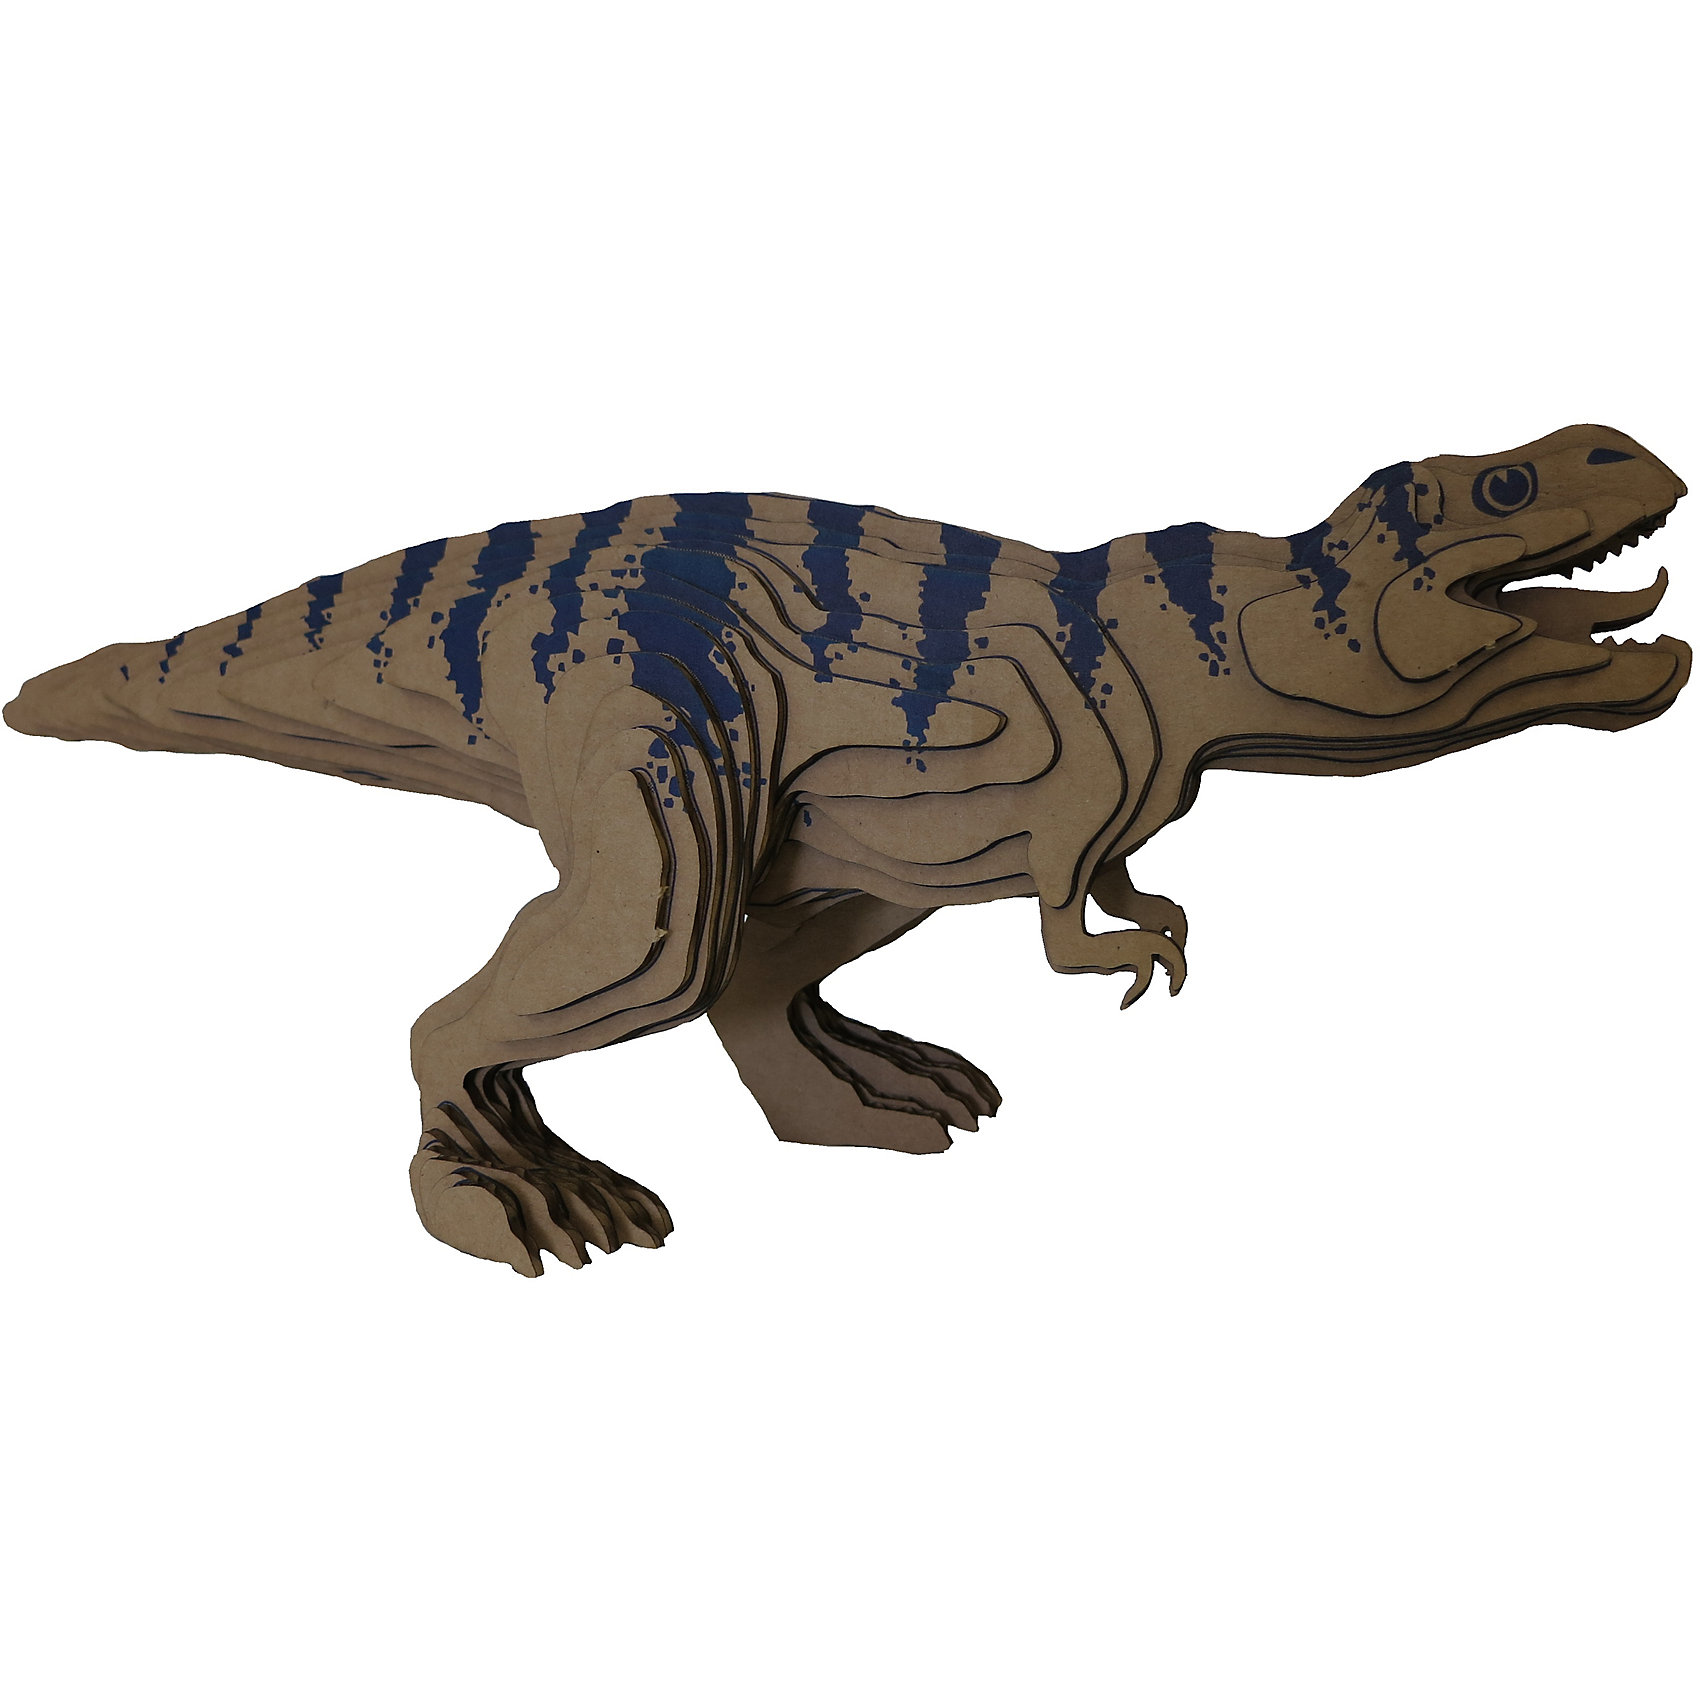 - 3D-Пазл «Тираннозавр» большой, PandaPuzzle пазлы magic pazle объемный 3d пазл эйфелева башня 78x38x35 см